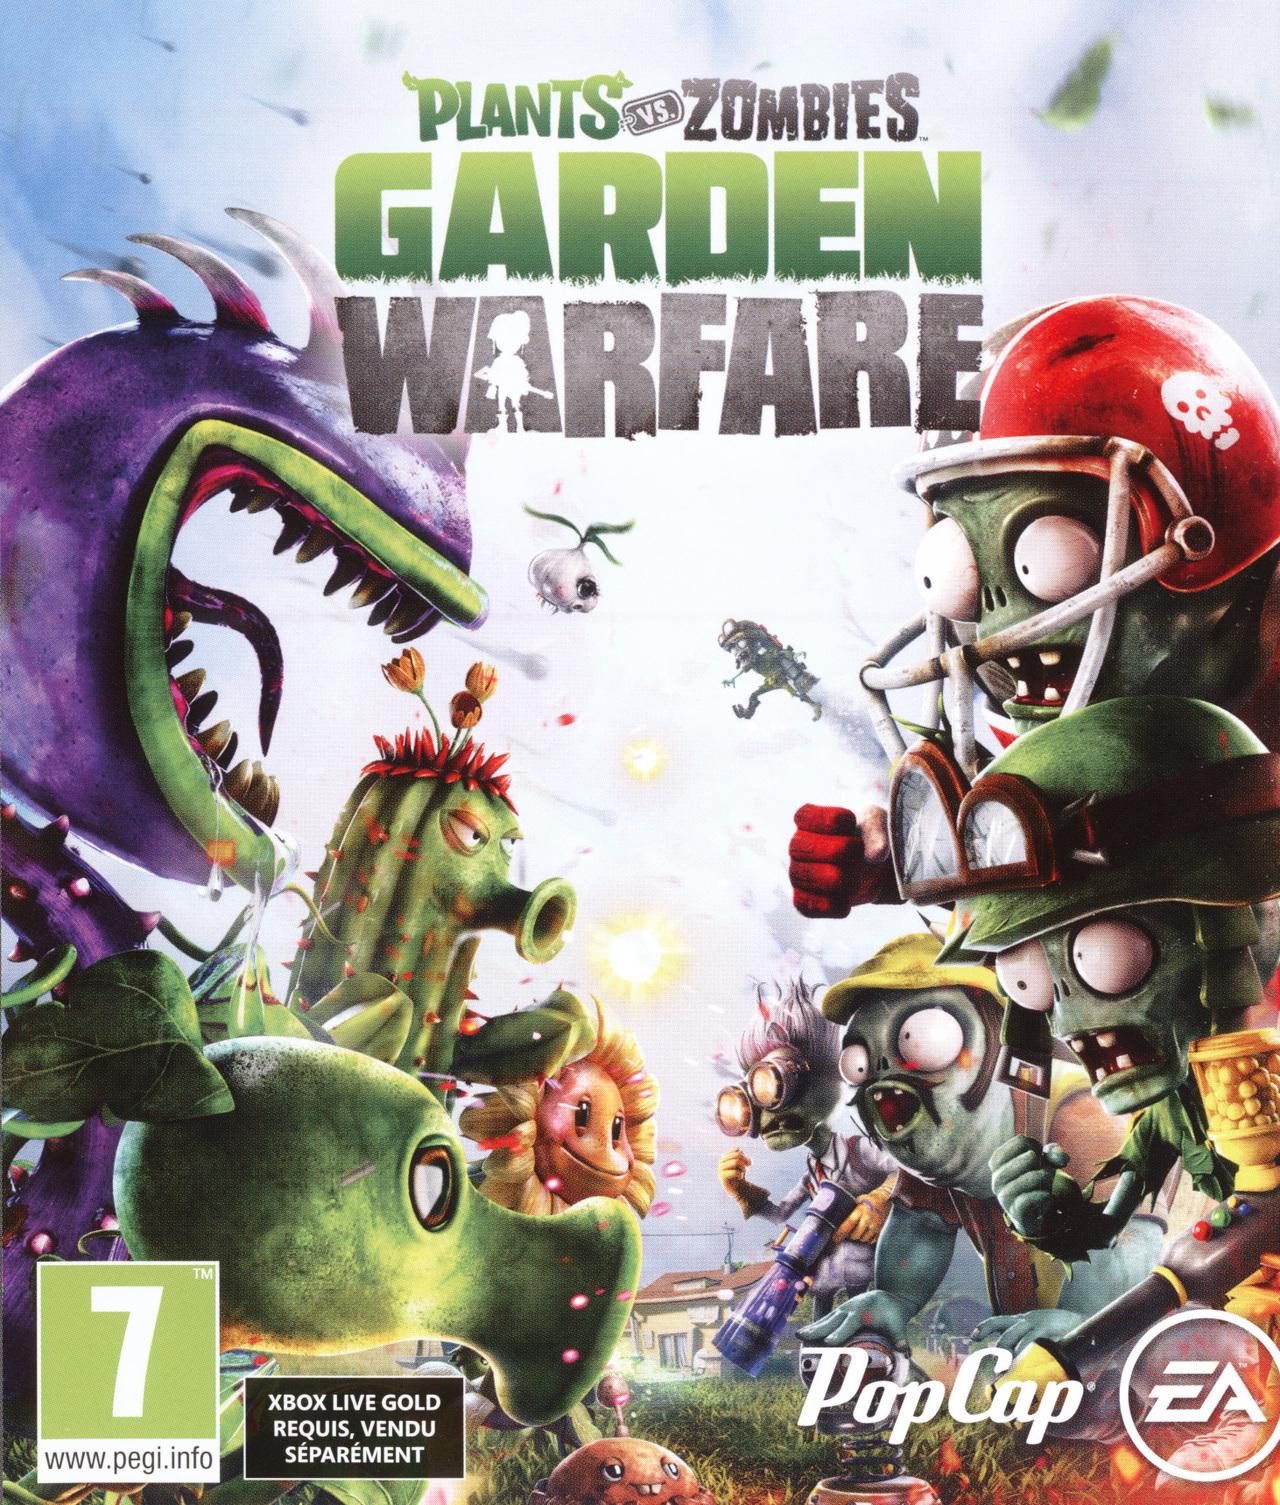 Plants vs zombies garden warfare sur xbox one - Plants vs zombies garden warfare videos ...